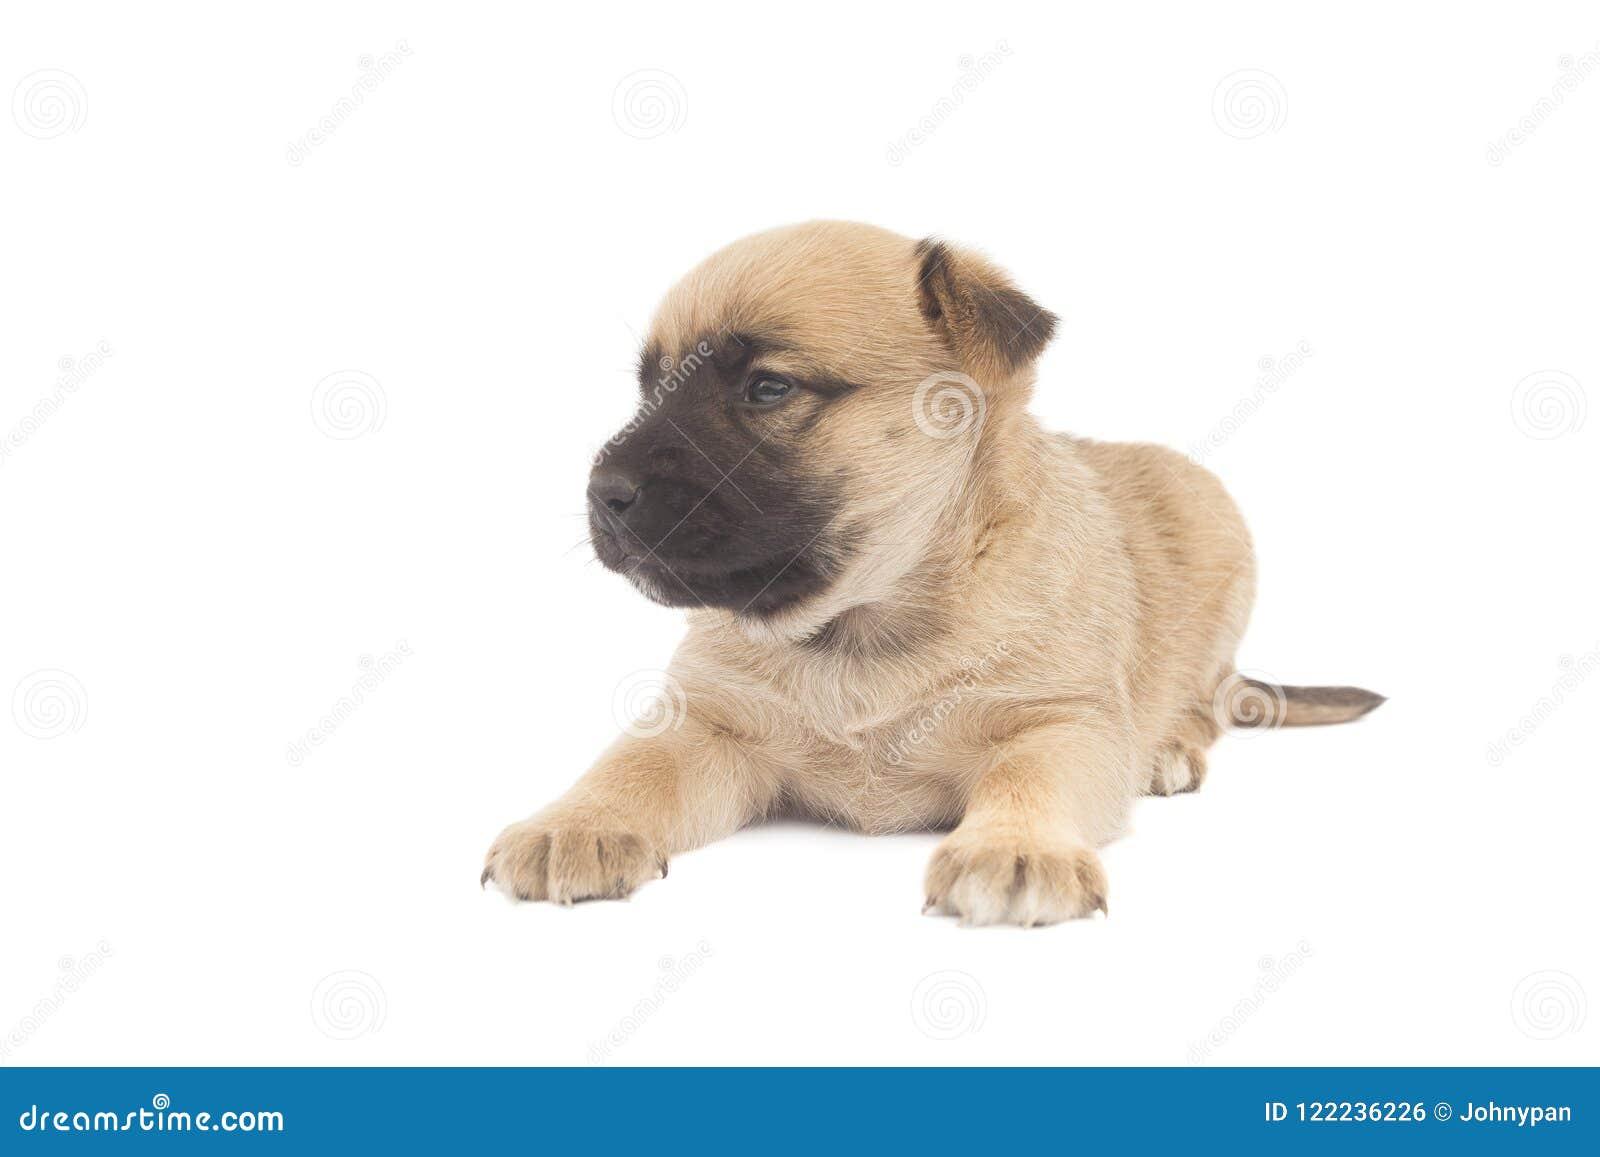 Sheperd baby dog or puppy